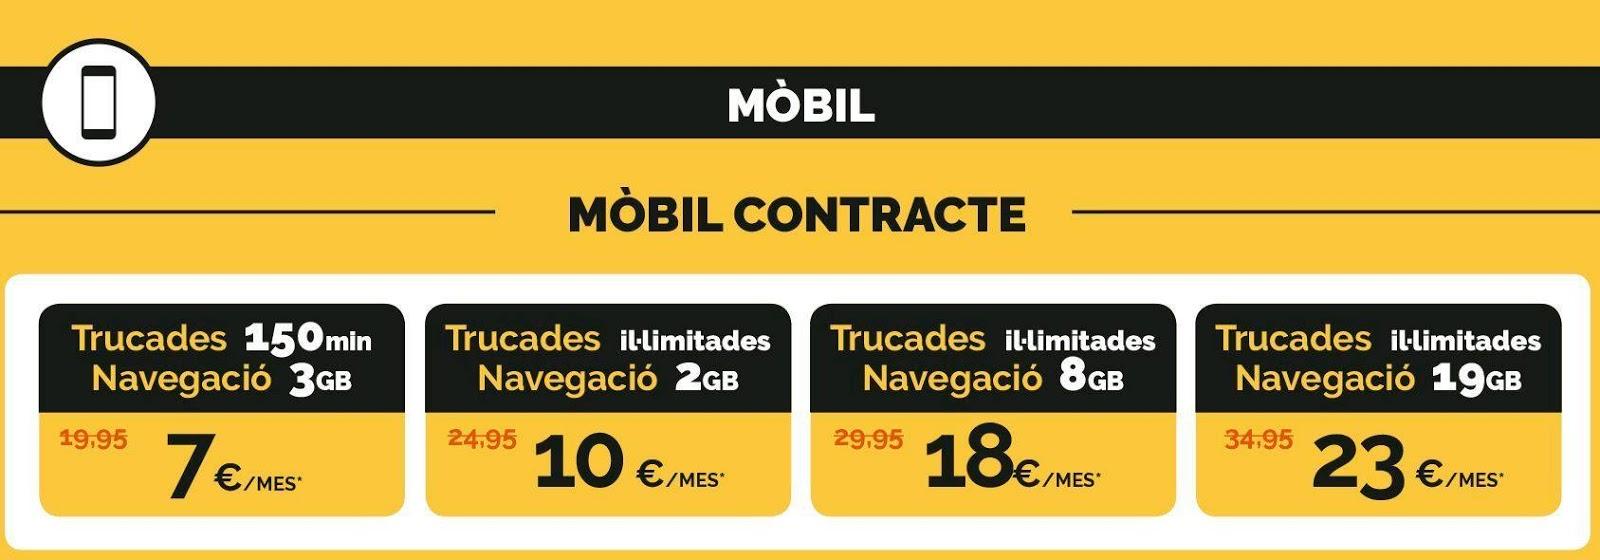 Nuevas tarifas móviles Parlem